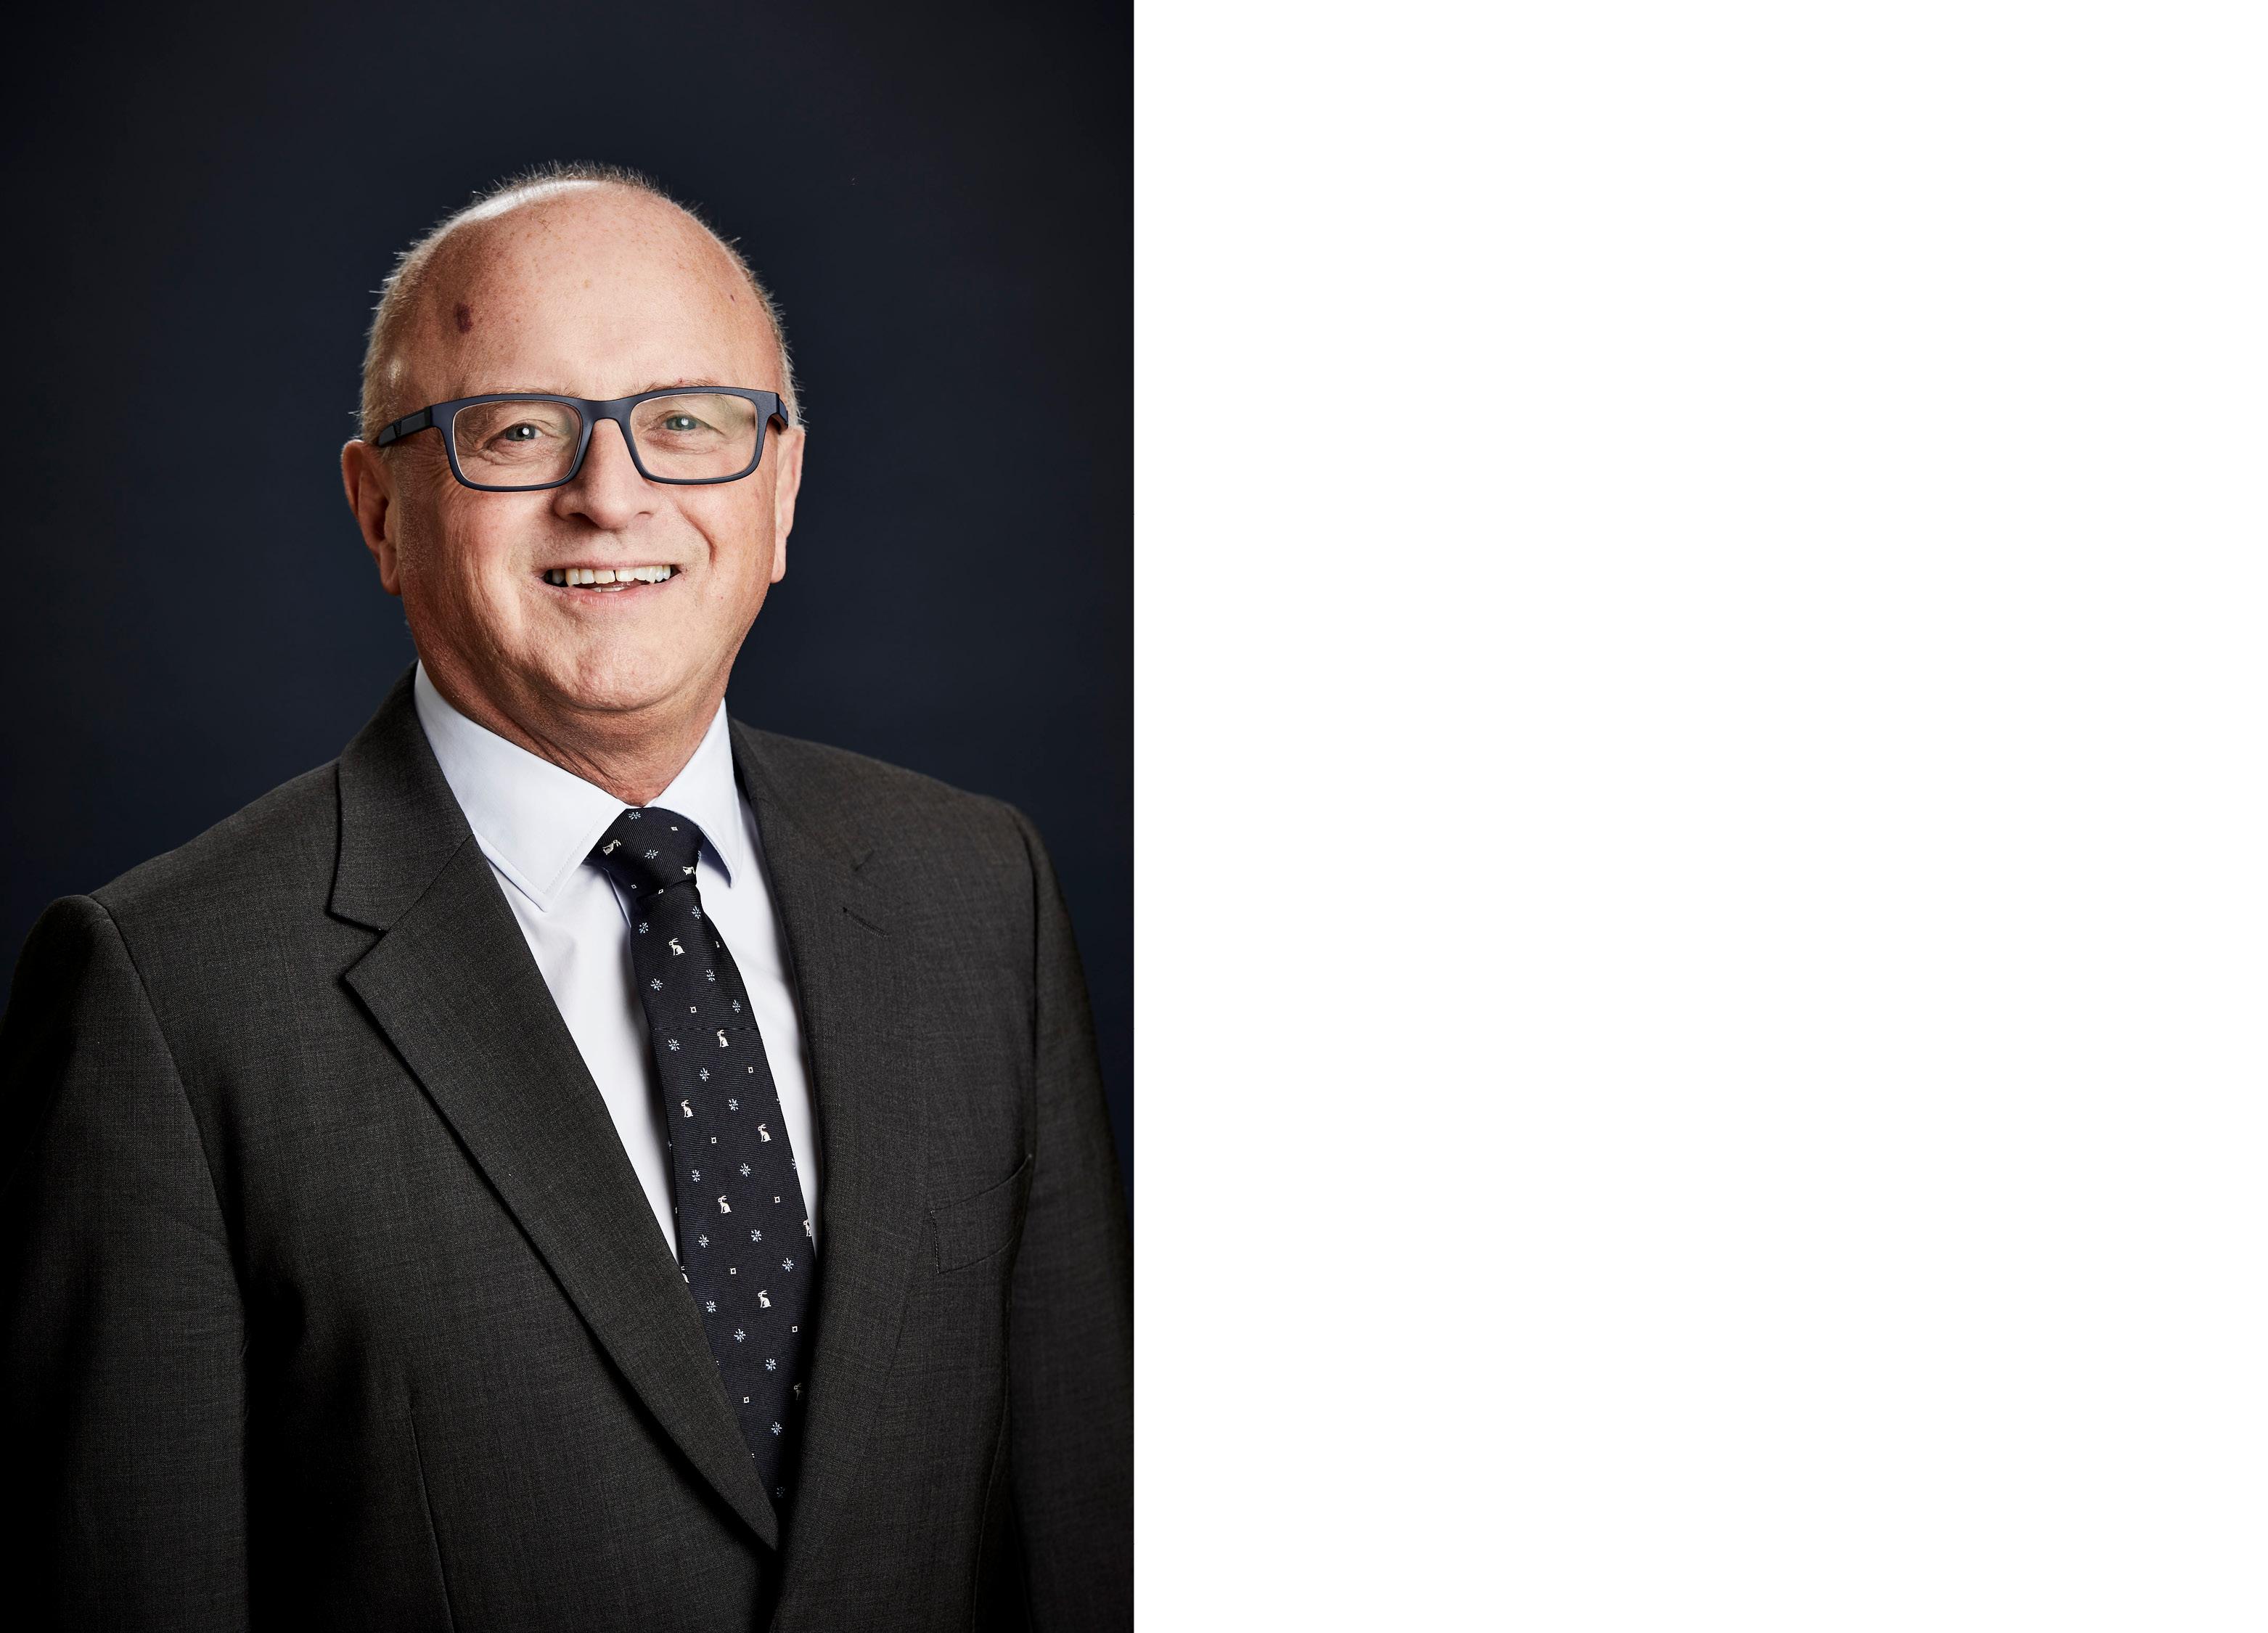 Company Shop Group Portraits - John Kitson